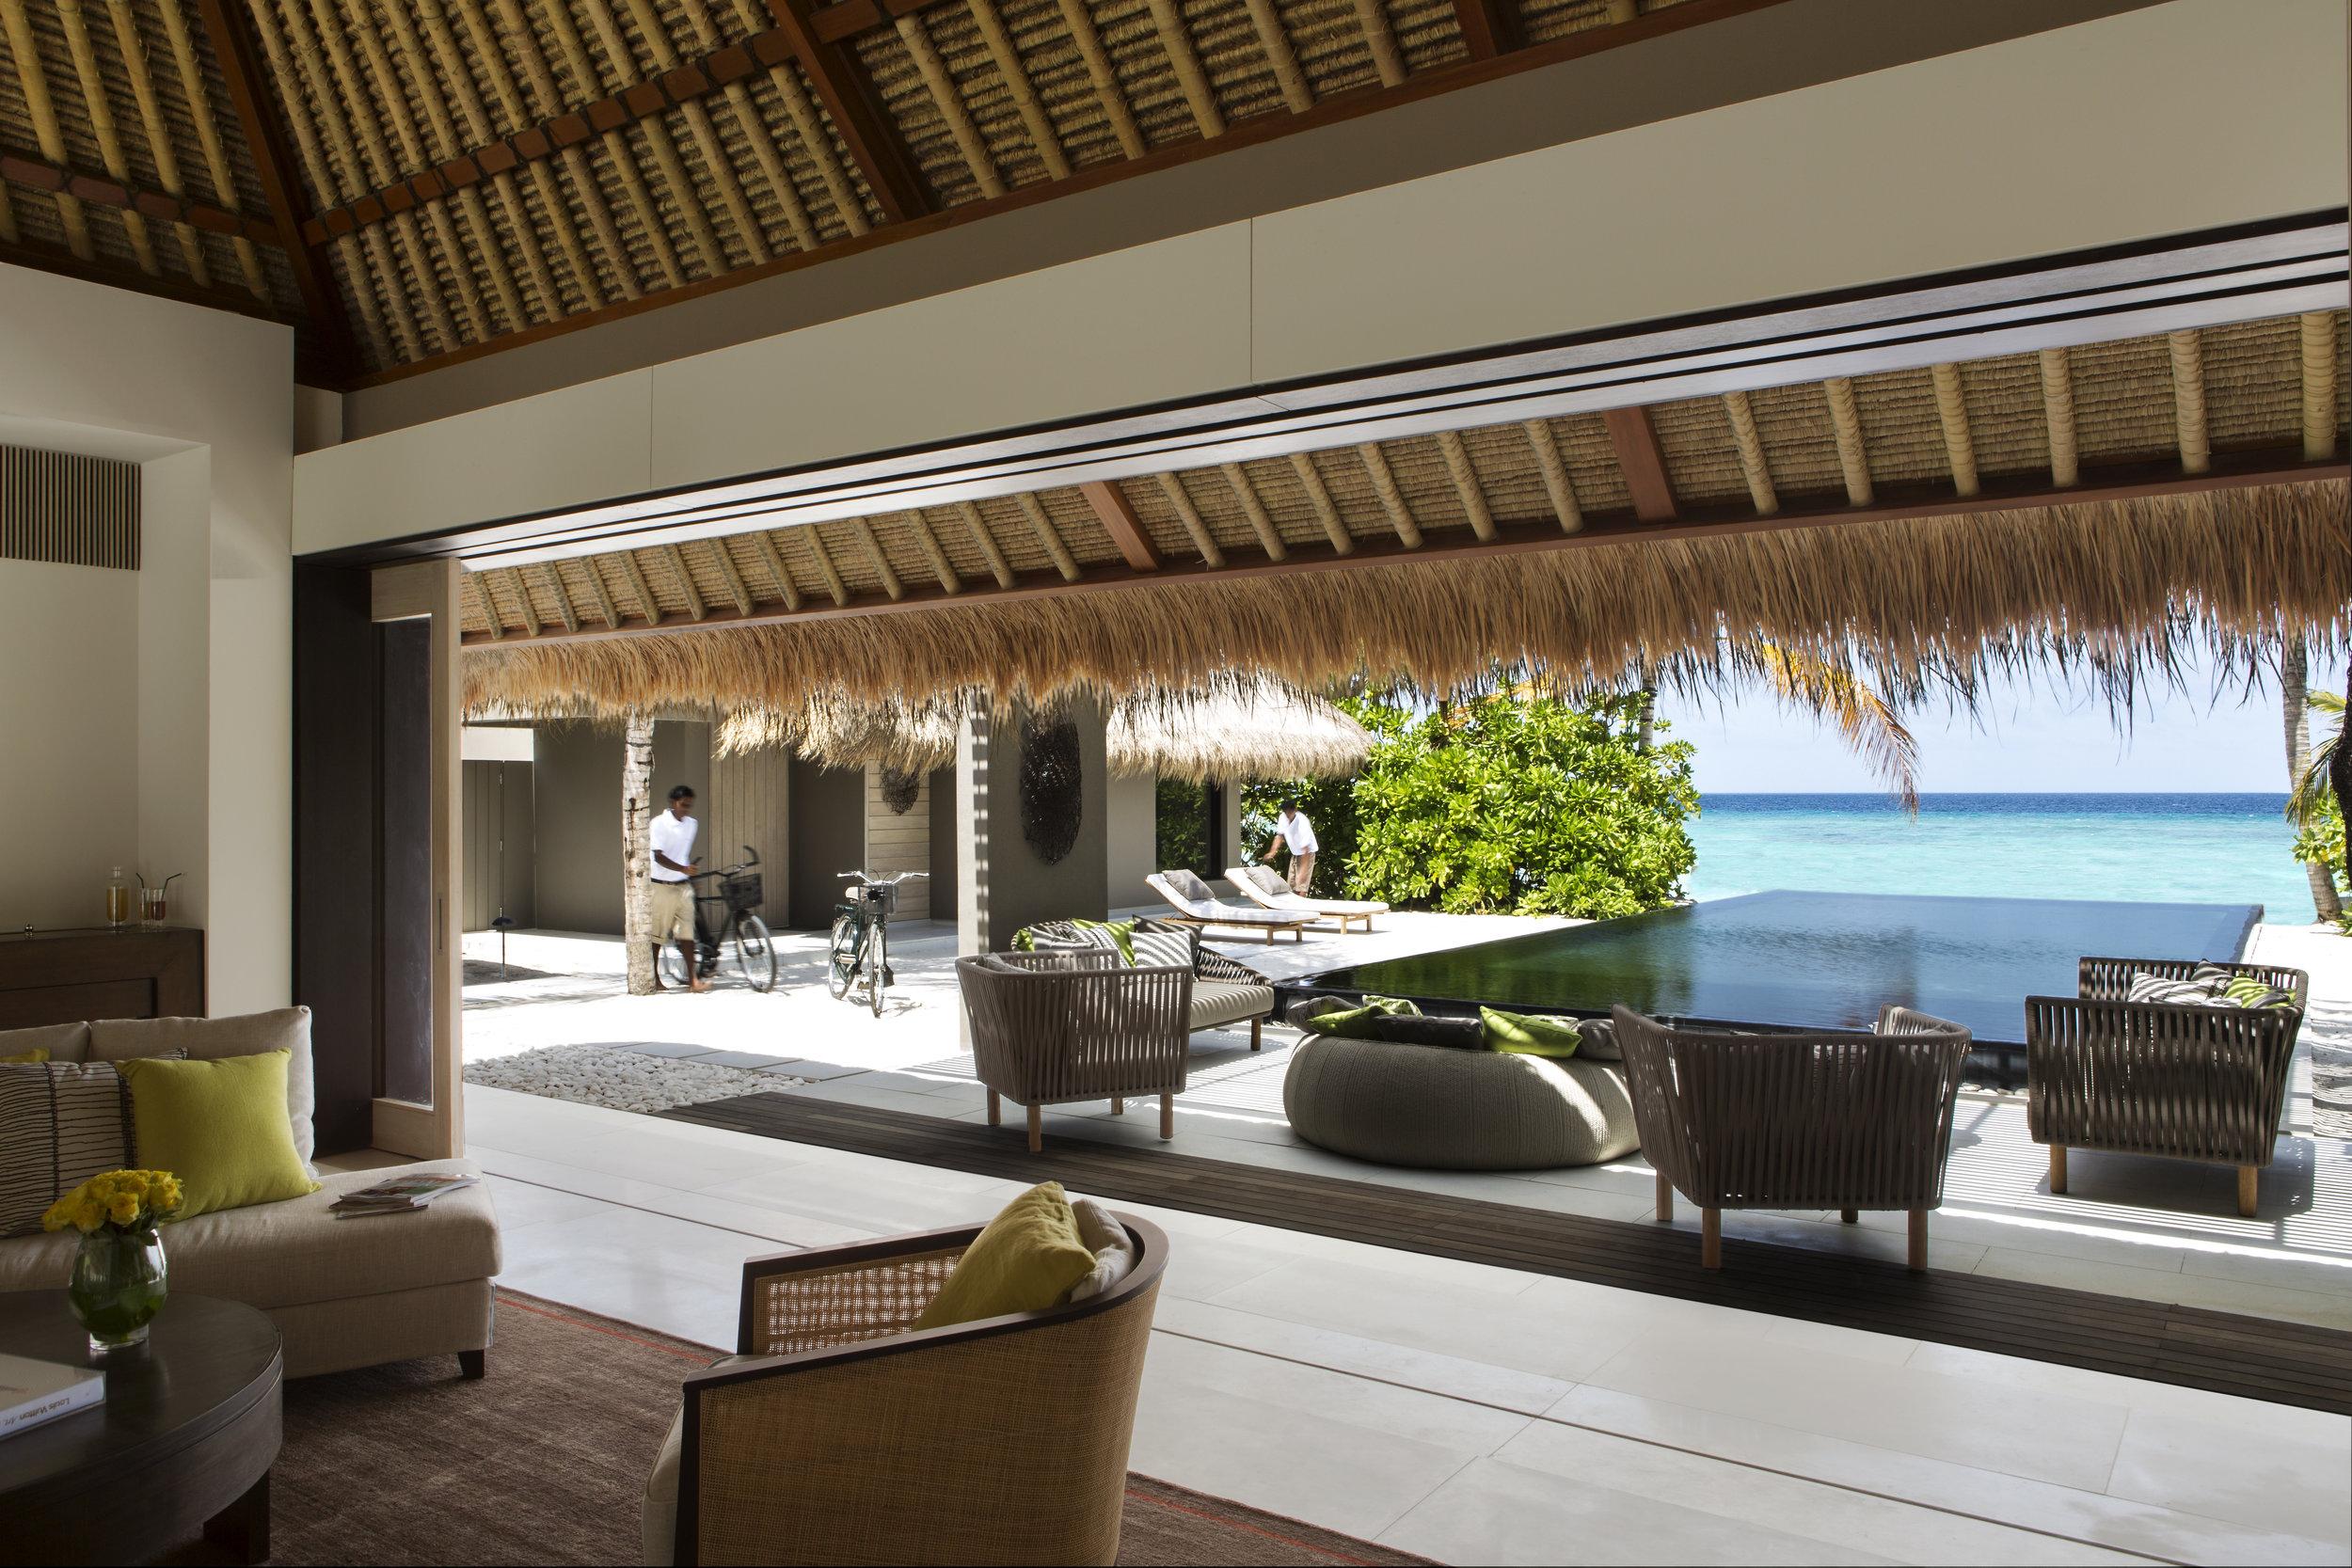 20180516044857_2-1-island-villa-2-bed-644-322-s-candito.jpg